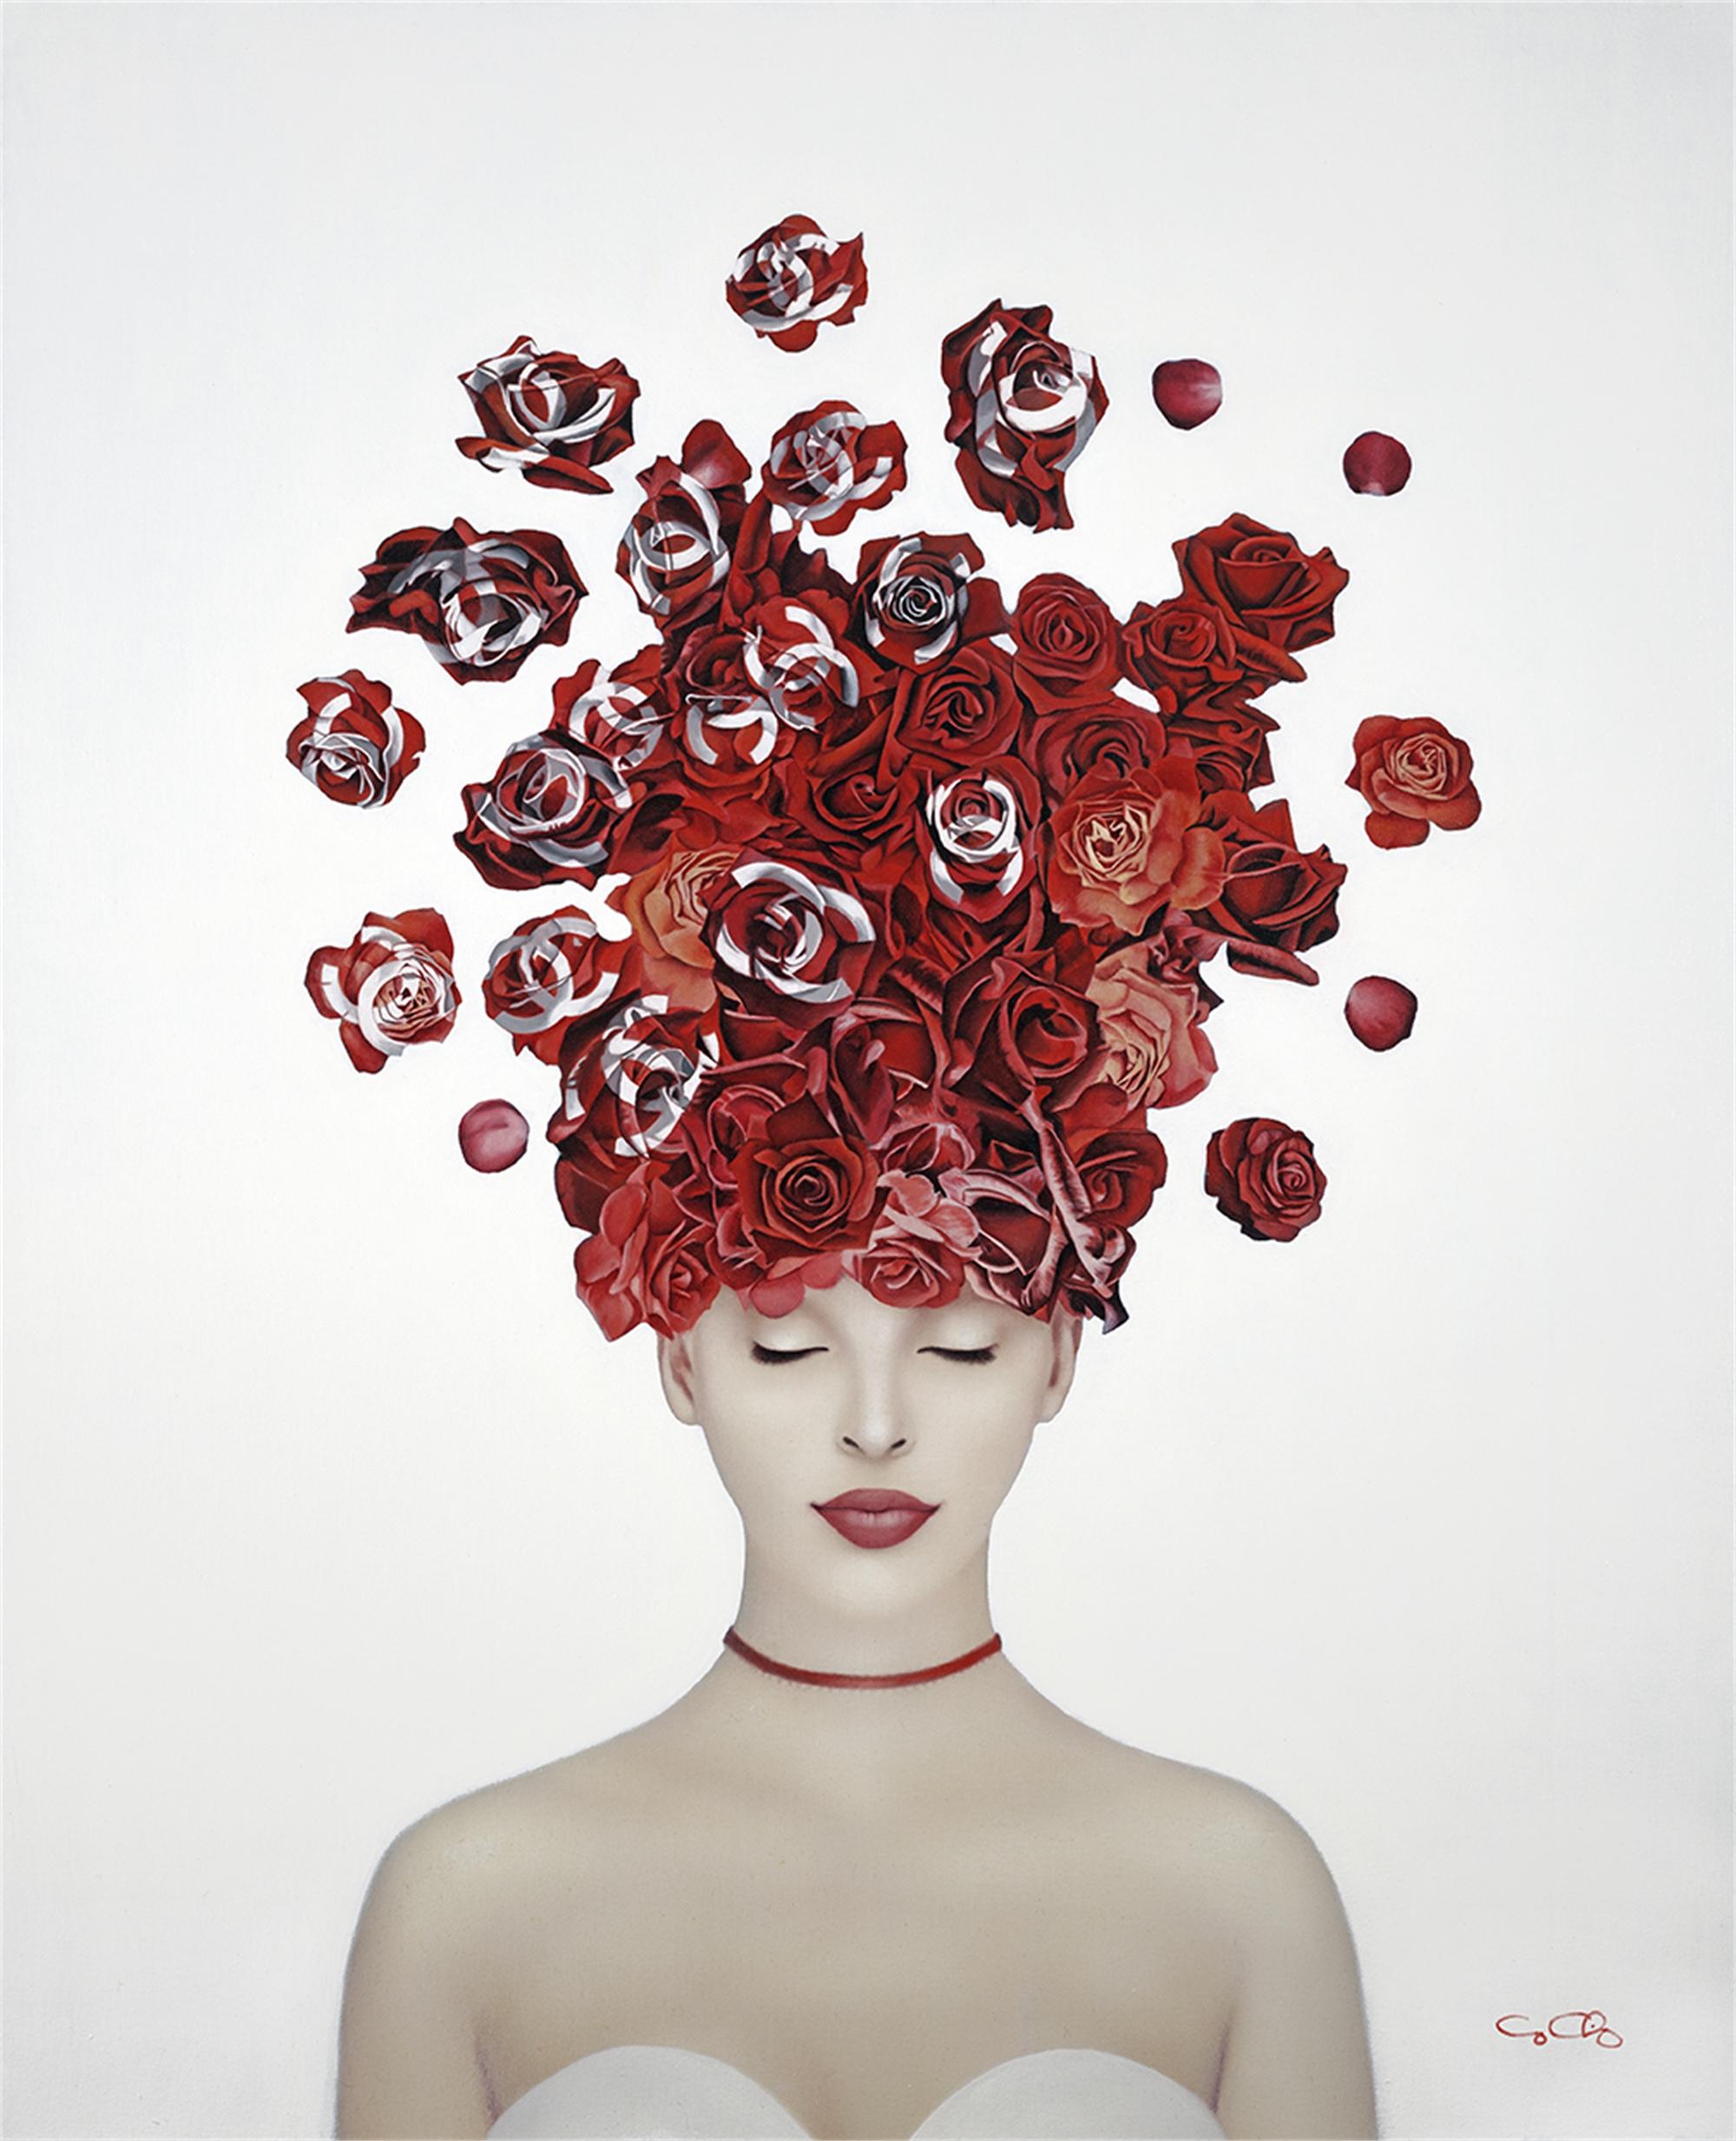 Flourish by George Charriez